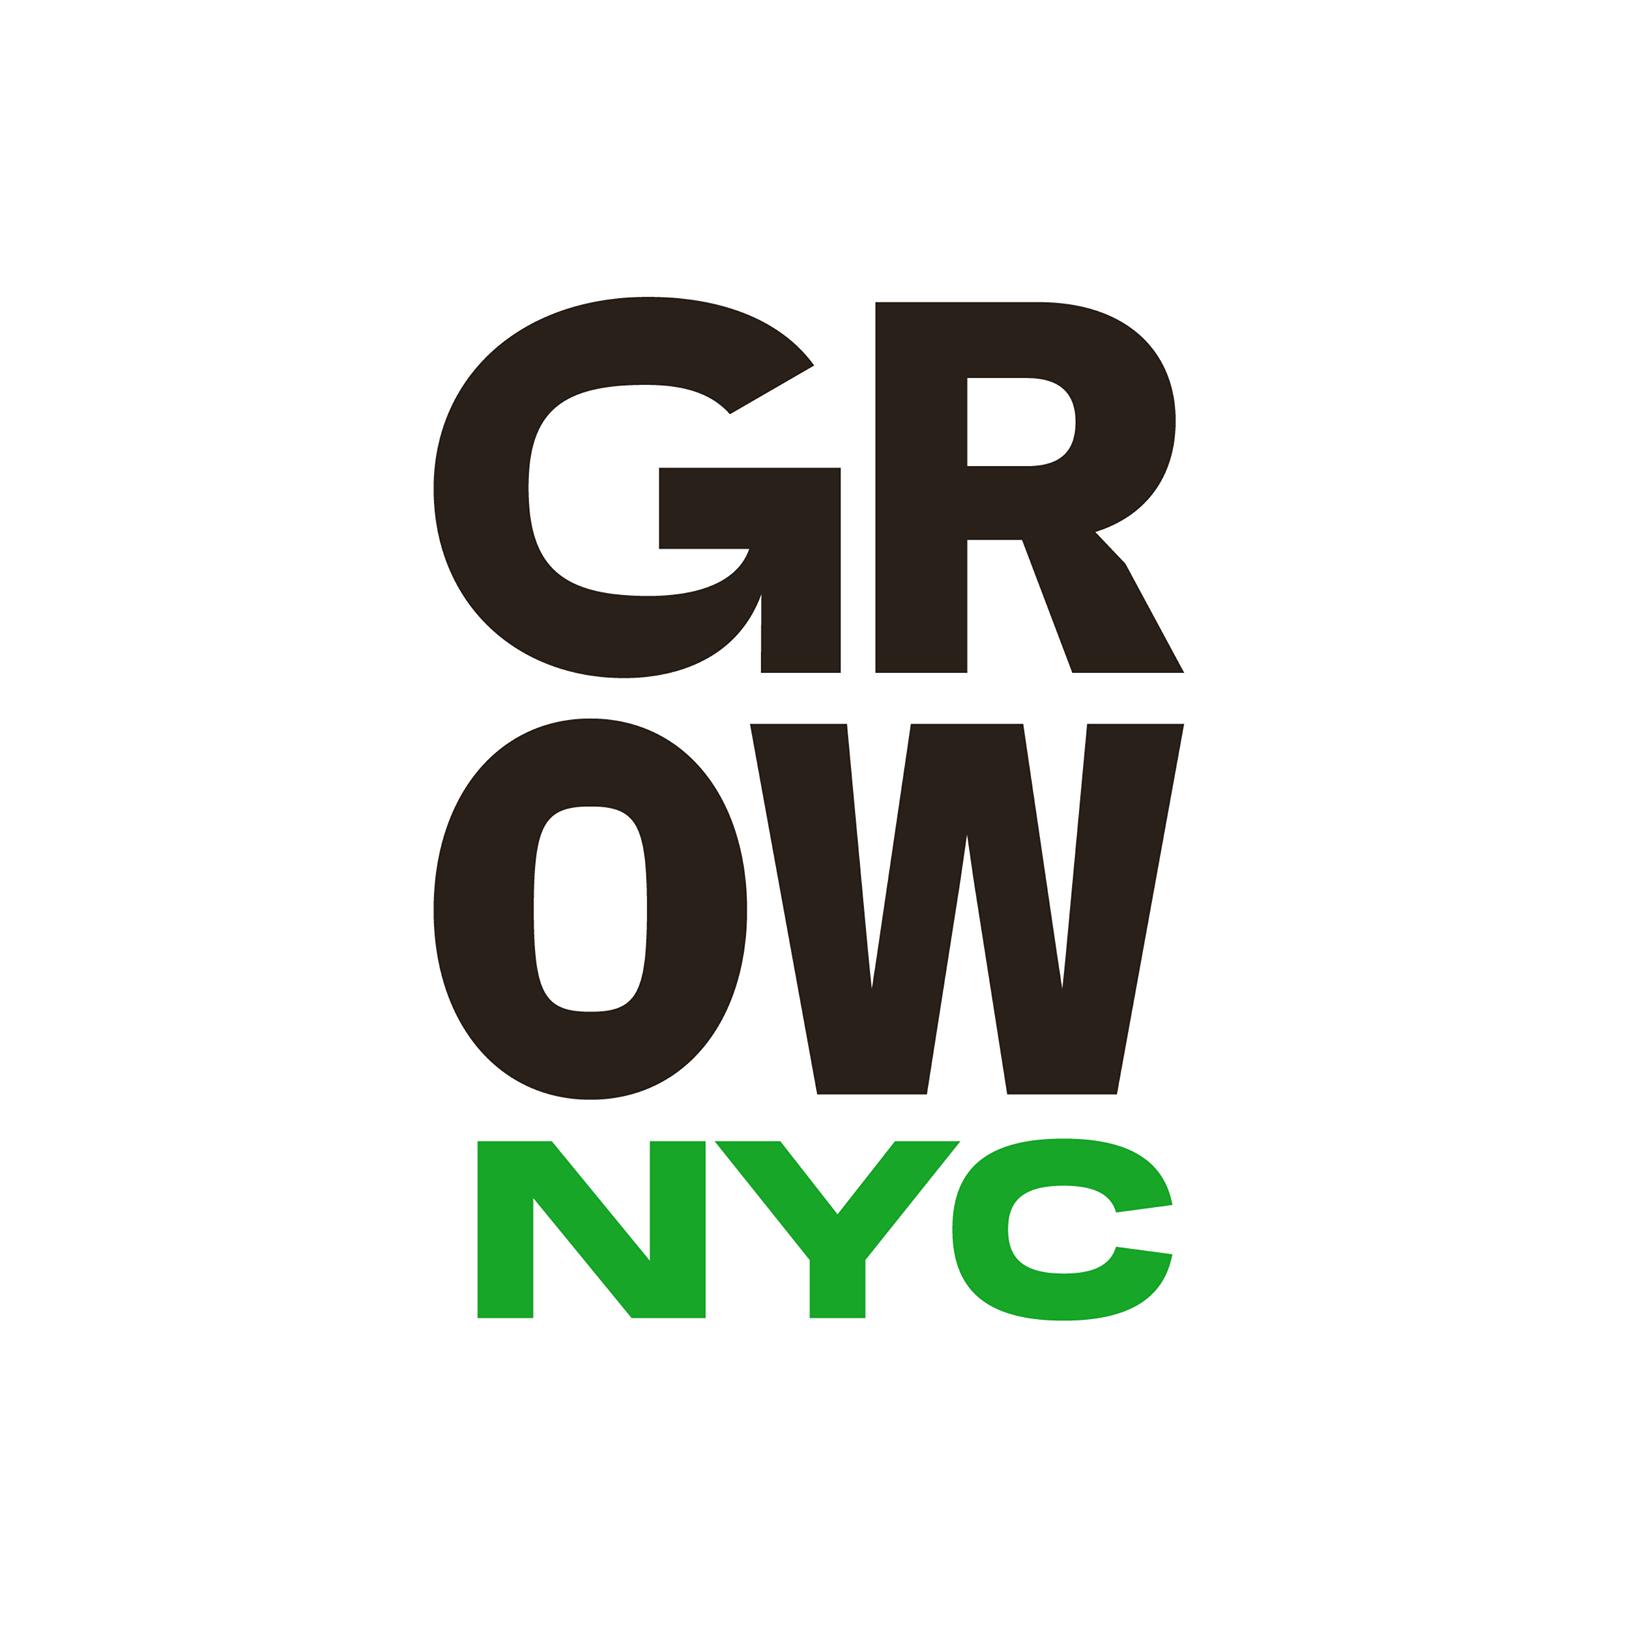 GrowNYC